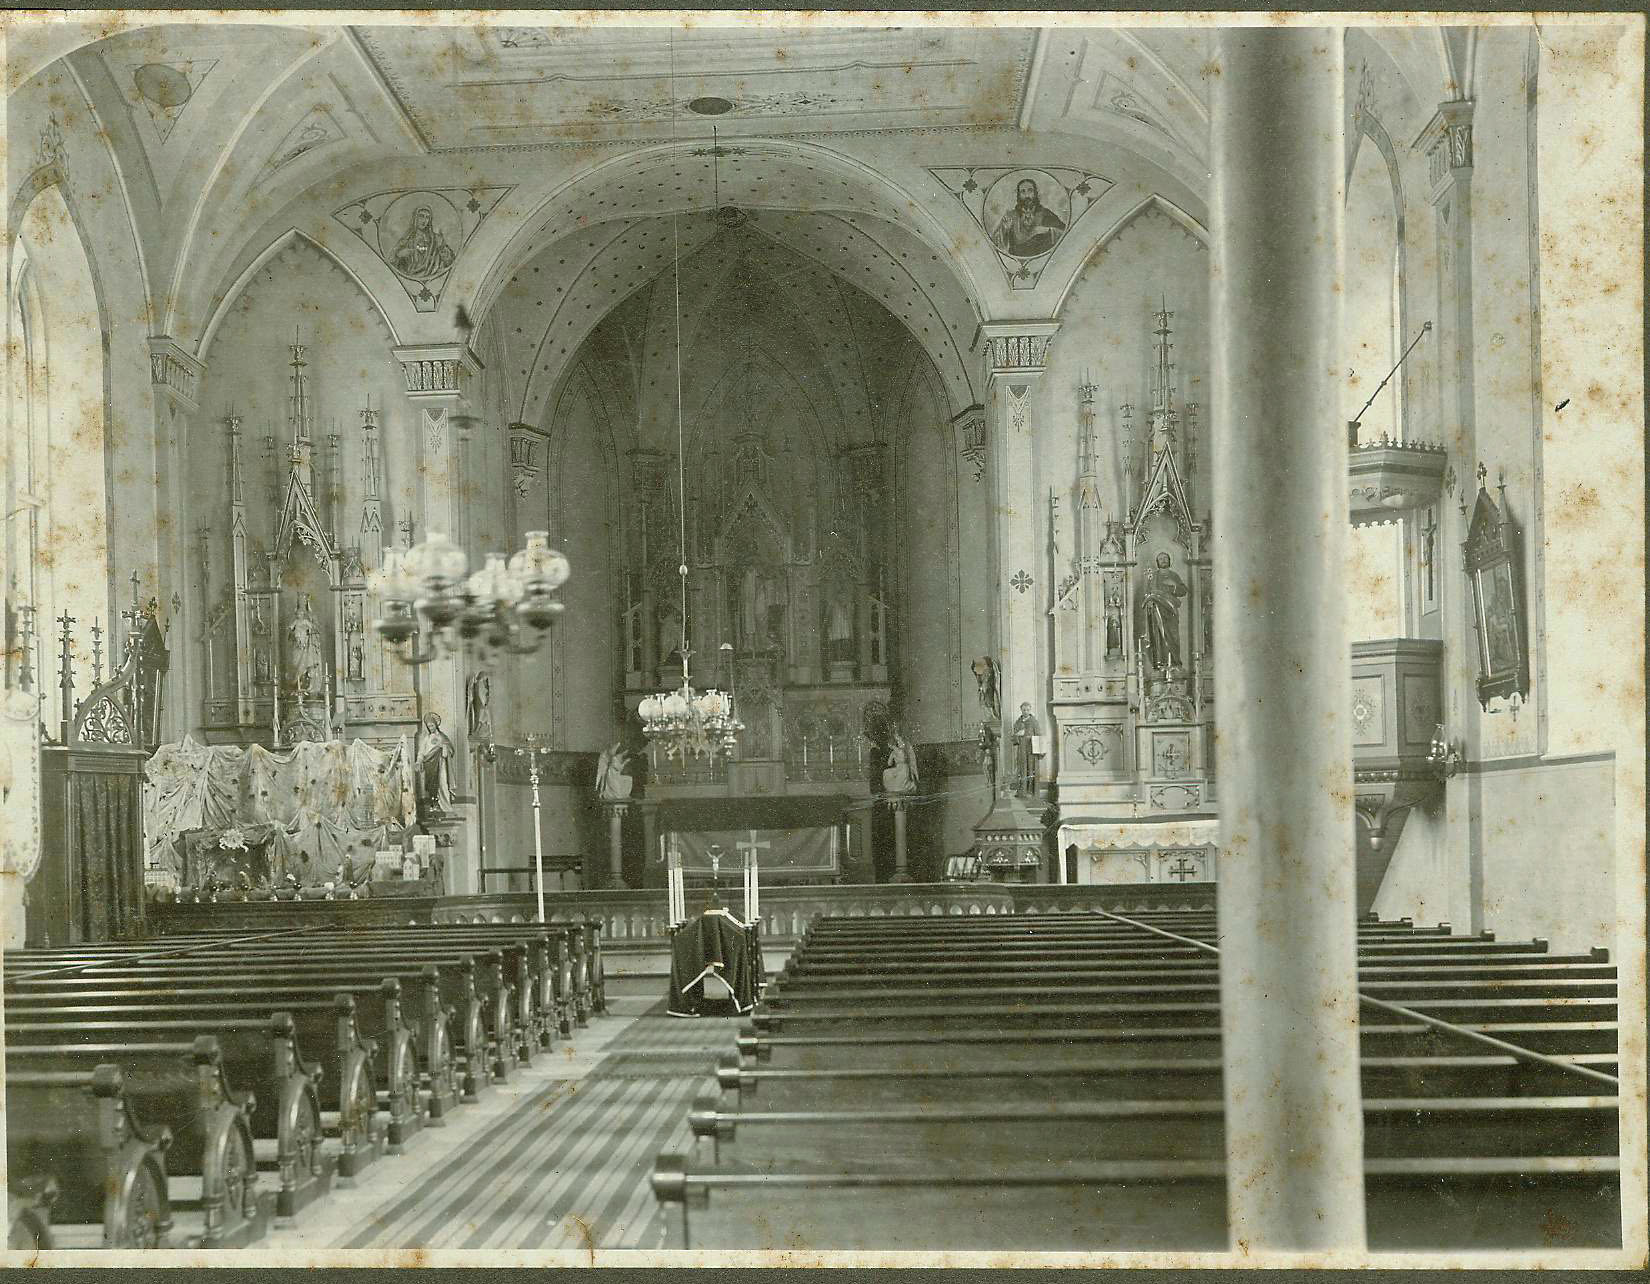 History of St  Thomas - St  Thomas Aquinas Parish School